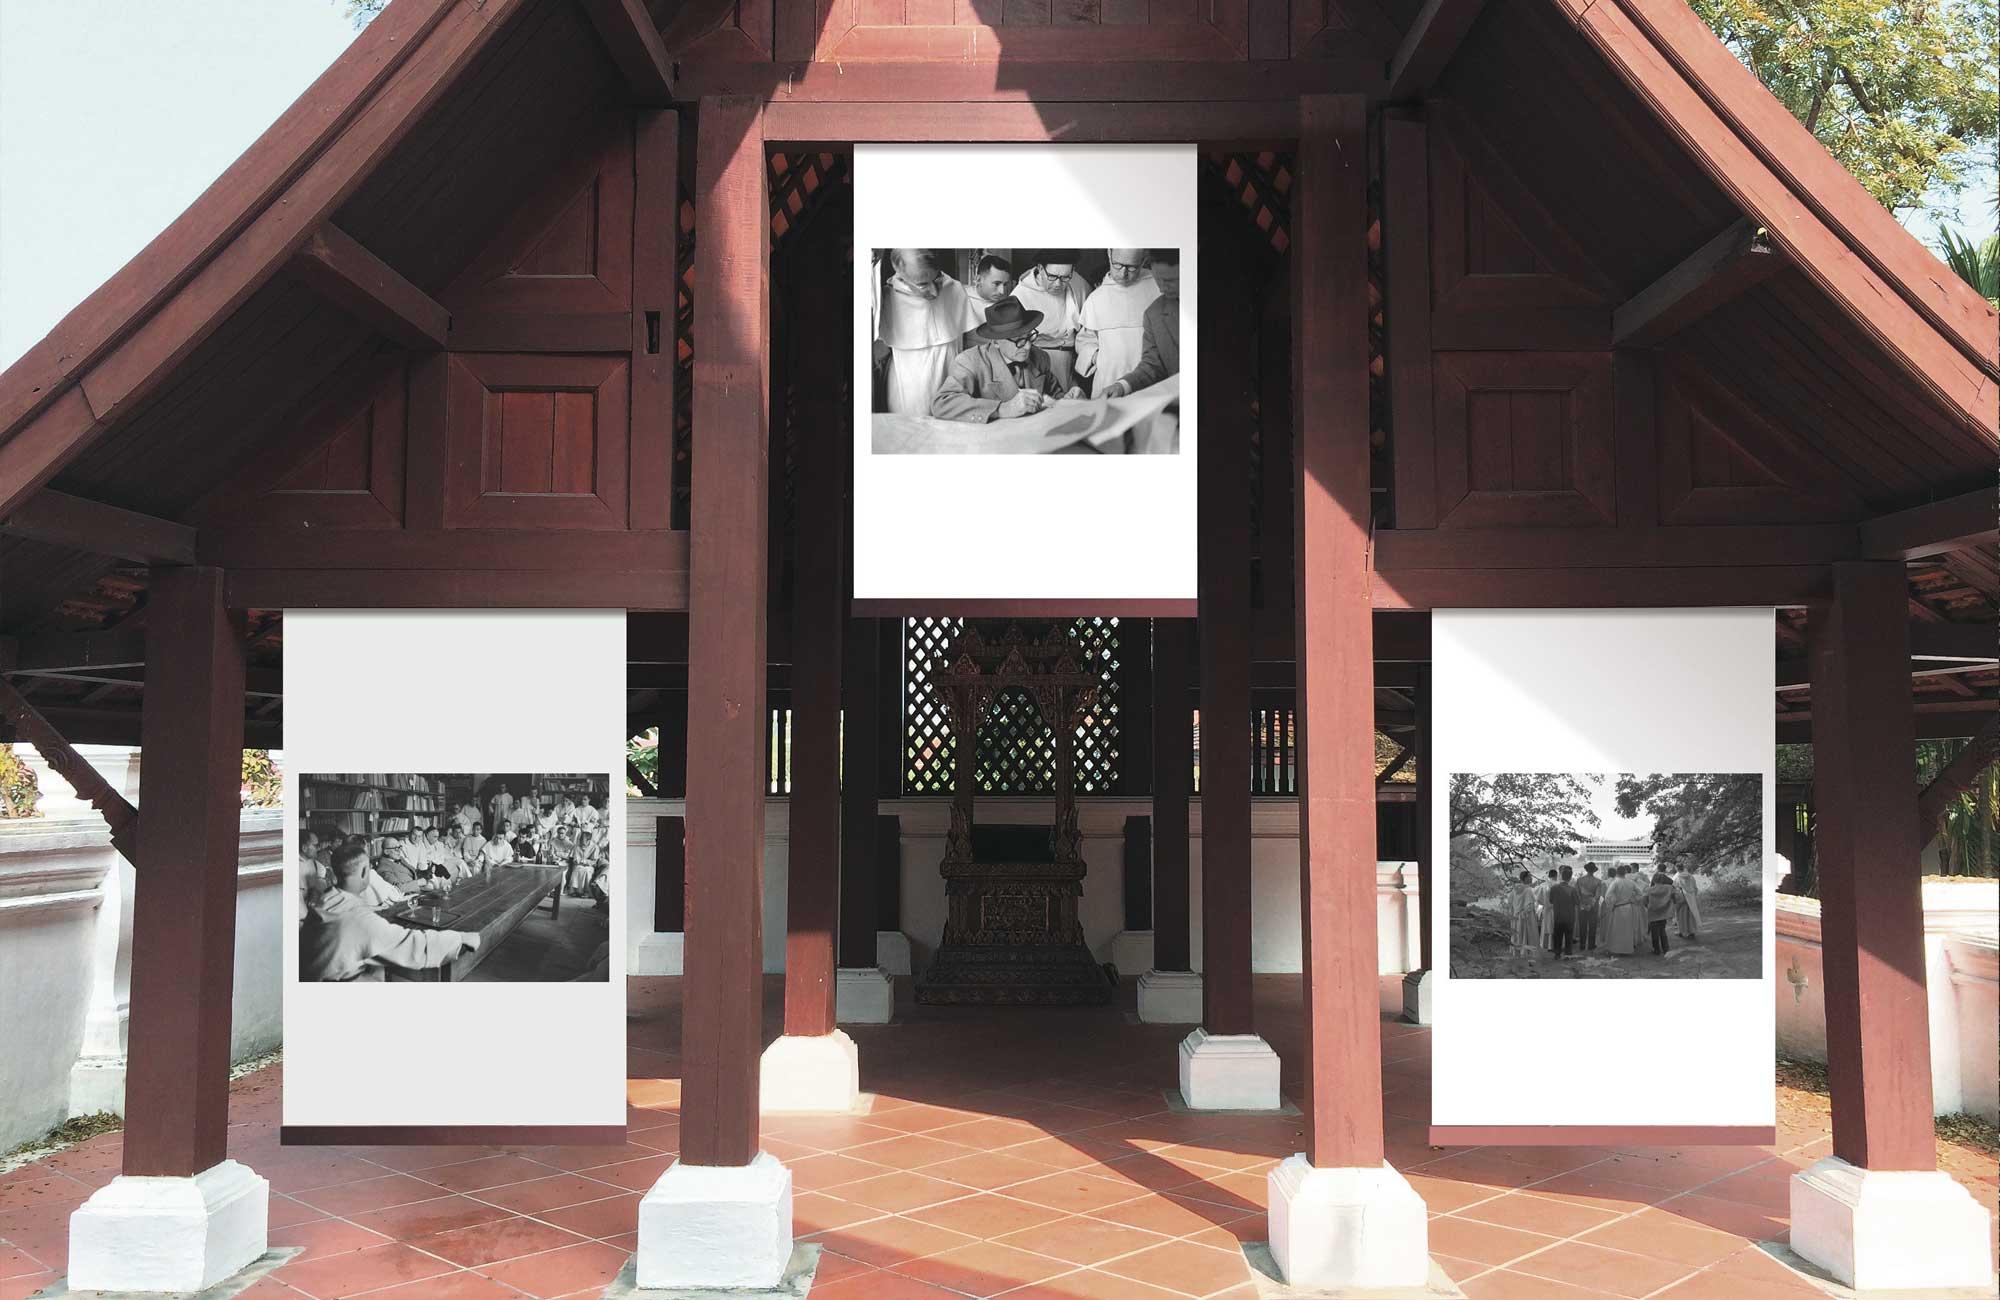 Exhibition_RenéBurri_©loup.ch_8